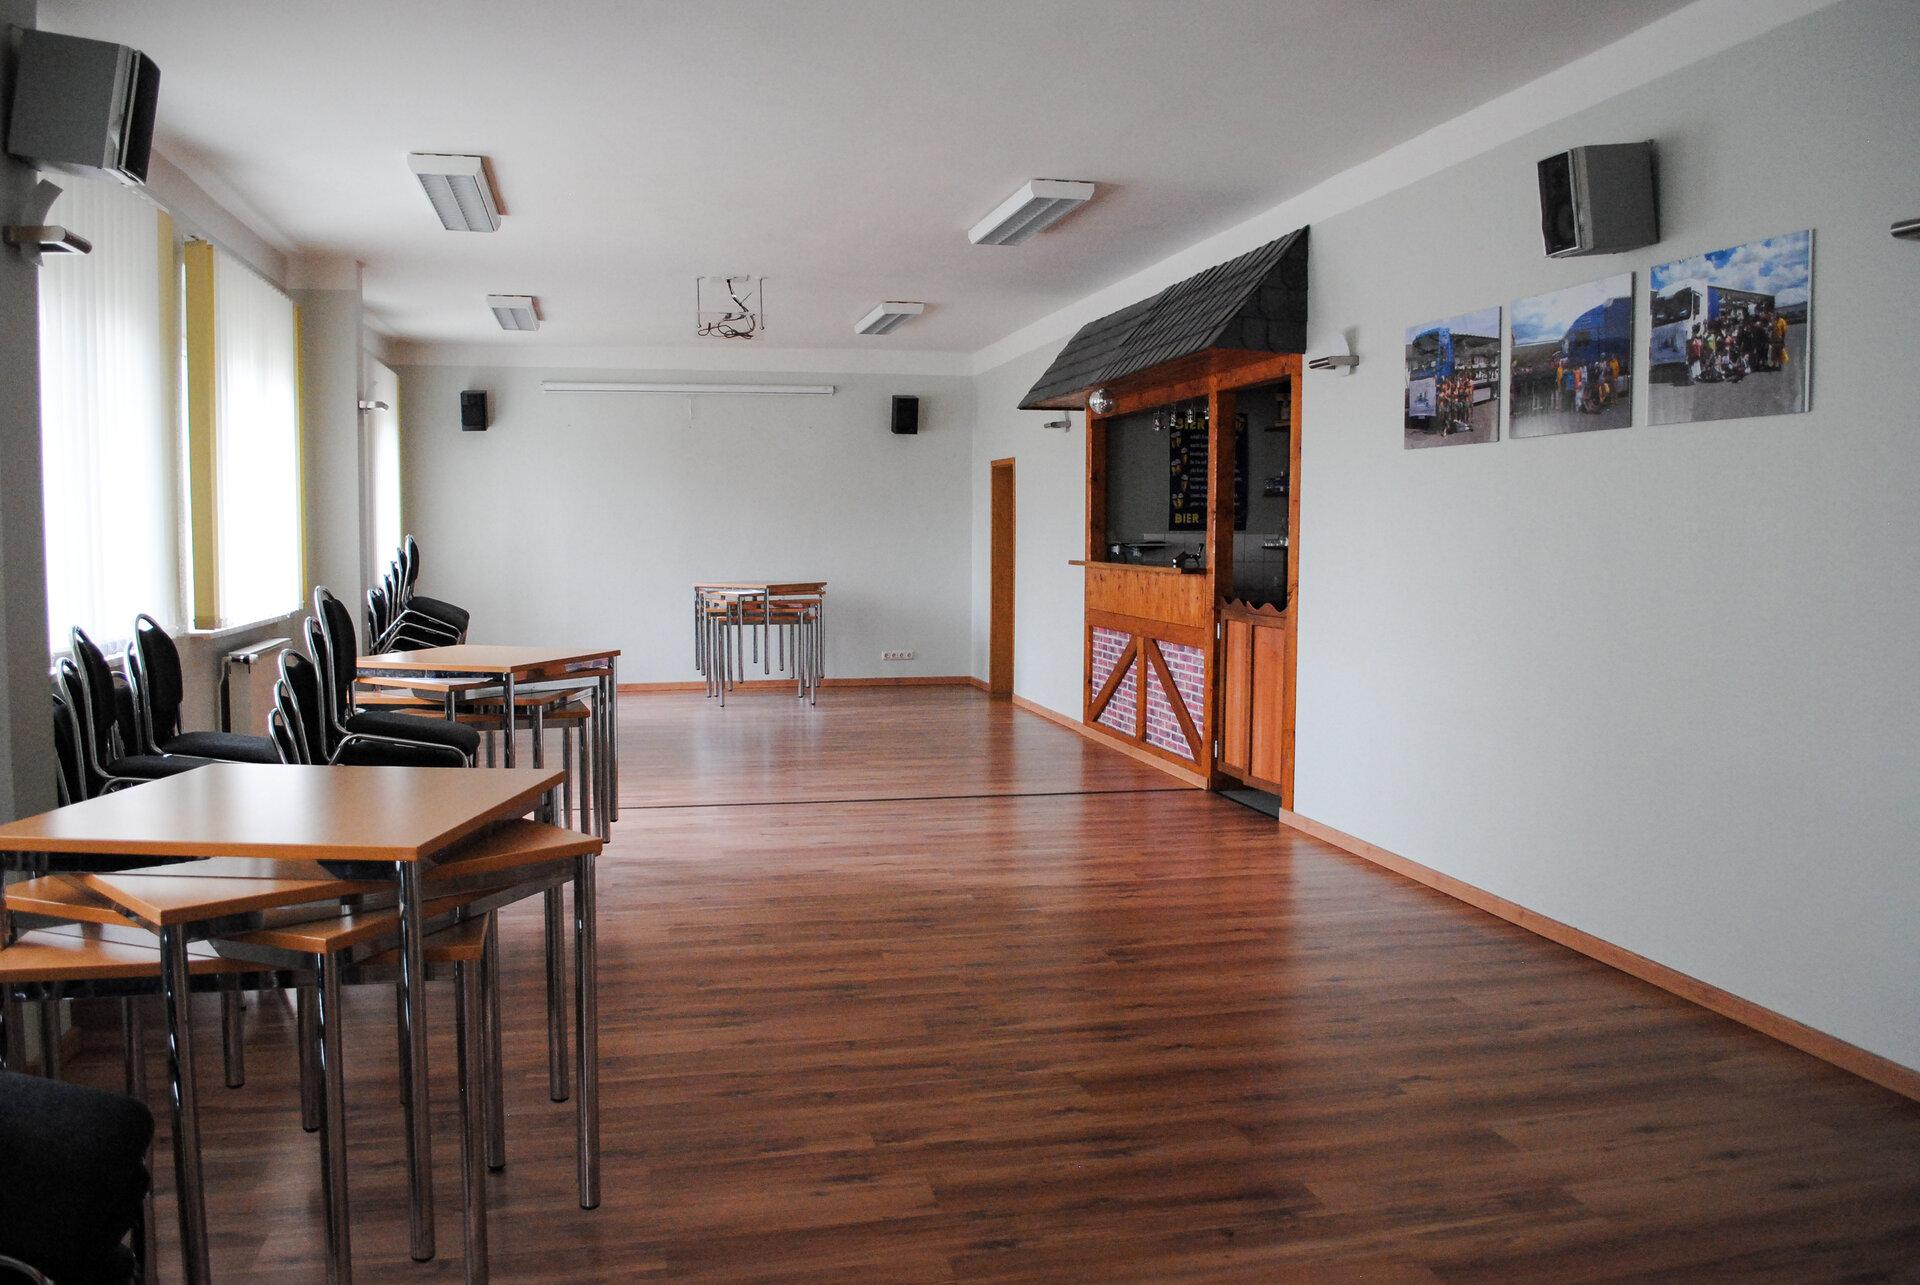 Gemeindehaus-Seefeld-3-2019